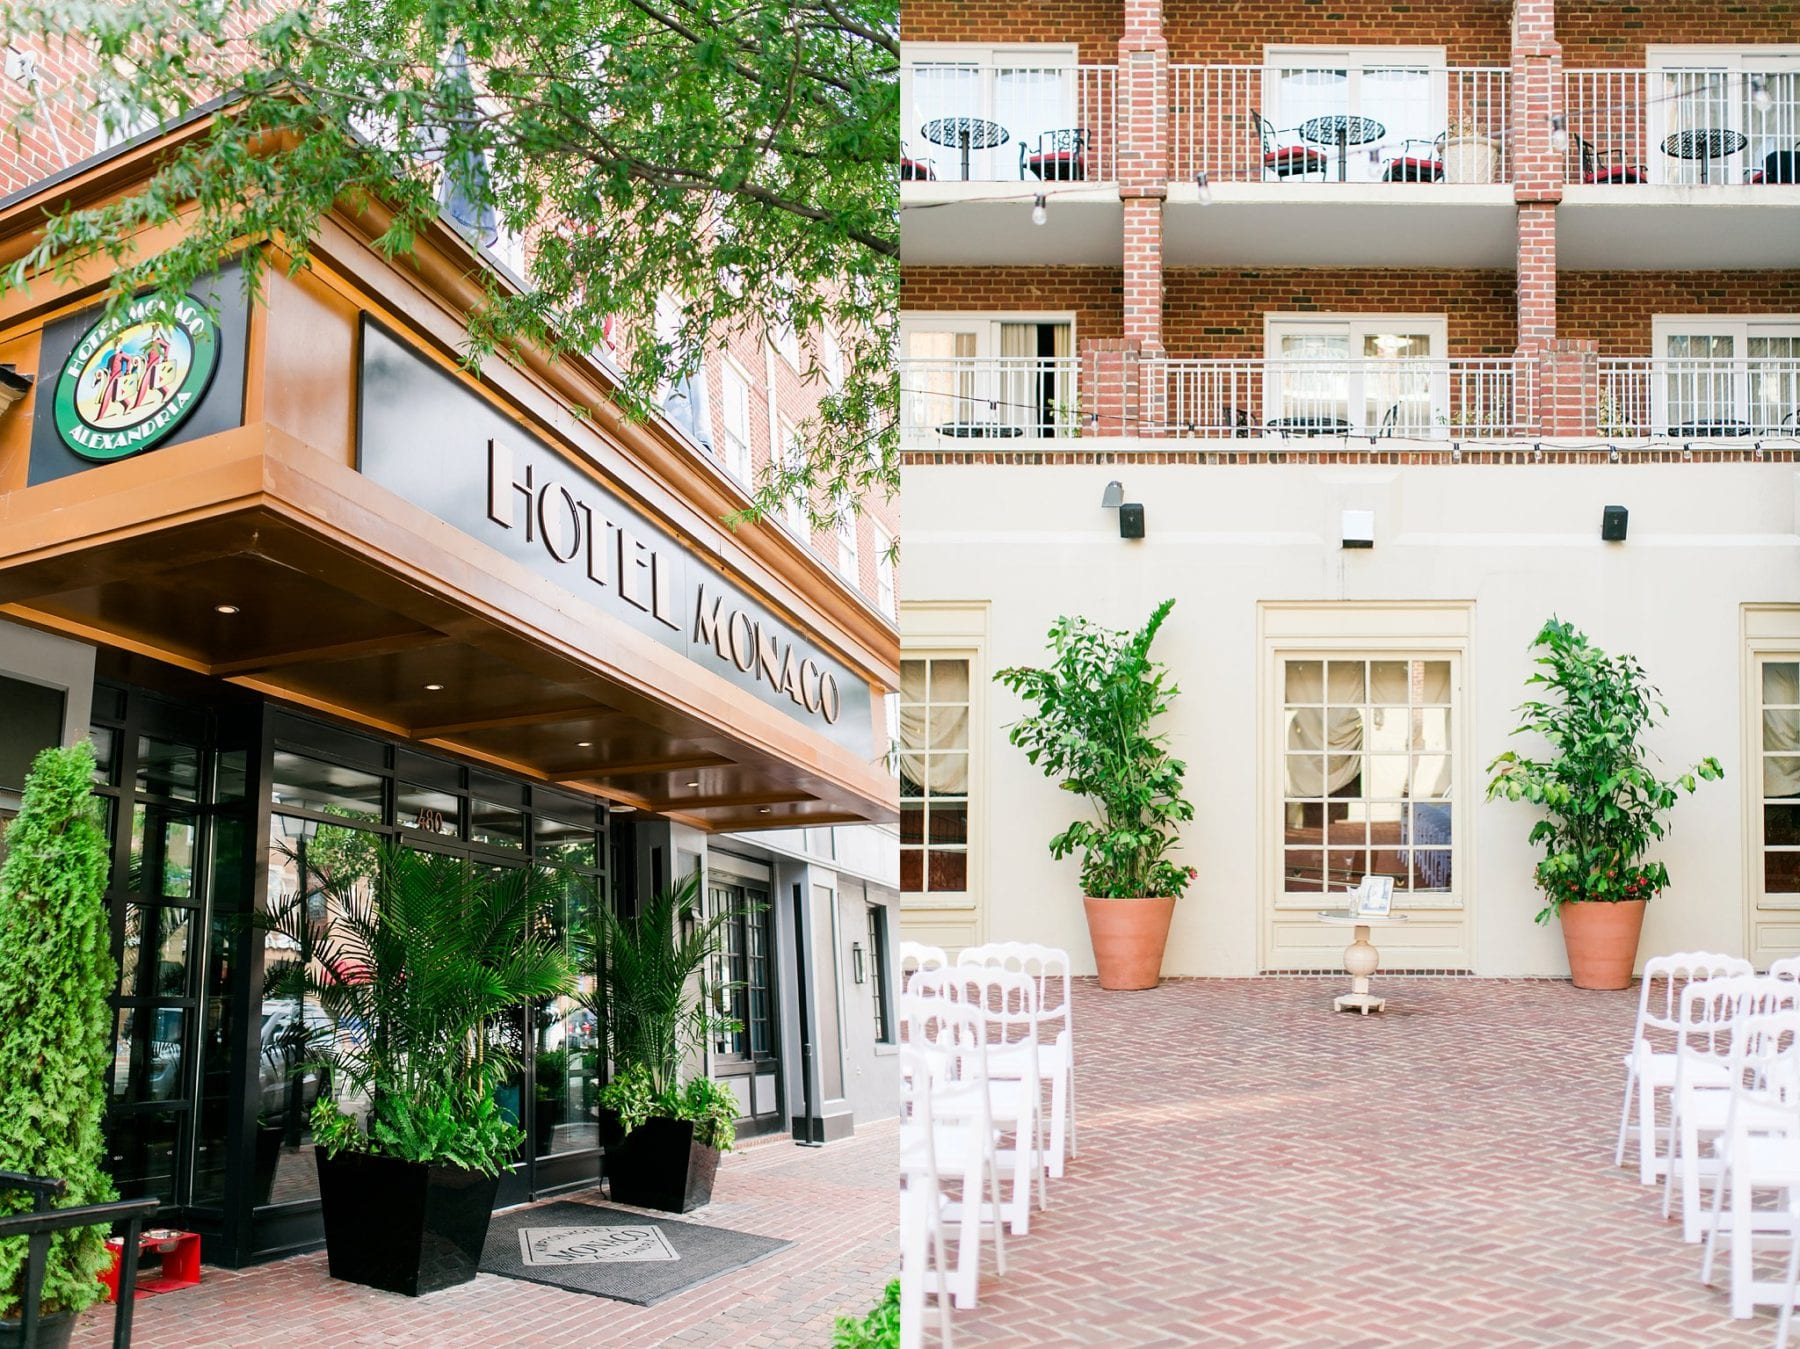 Hotel Monaco Wedding Photos Virginia Wedding Photographer Megan Kelsey Photography Kevin & Morgan-373.JPG